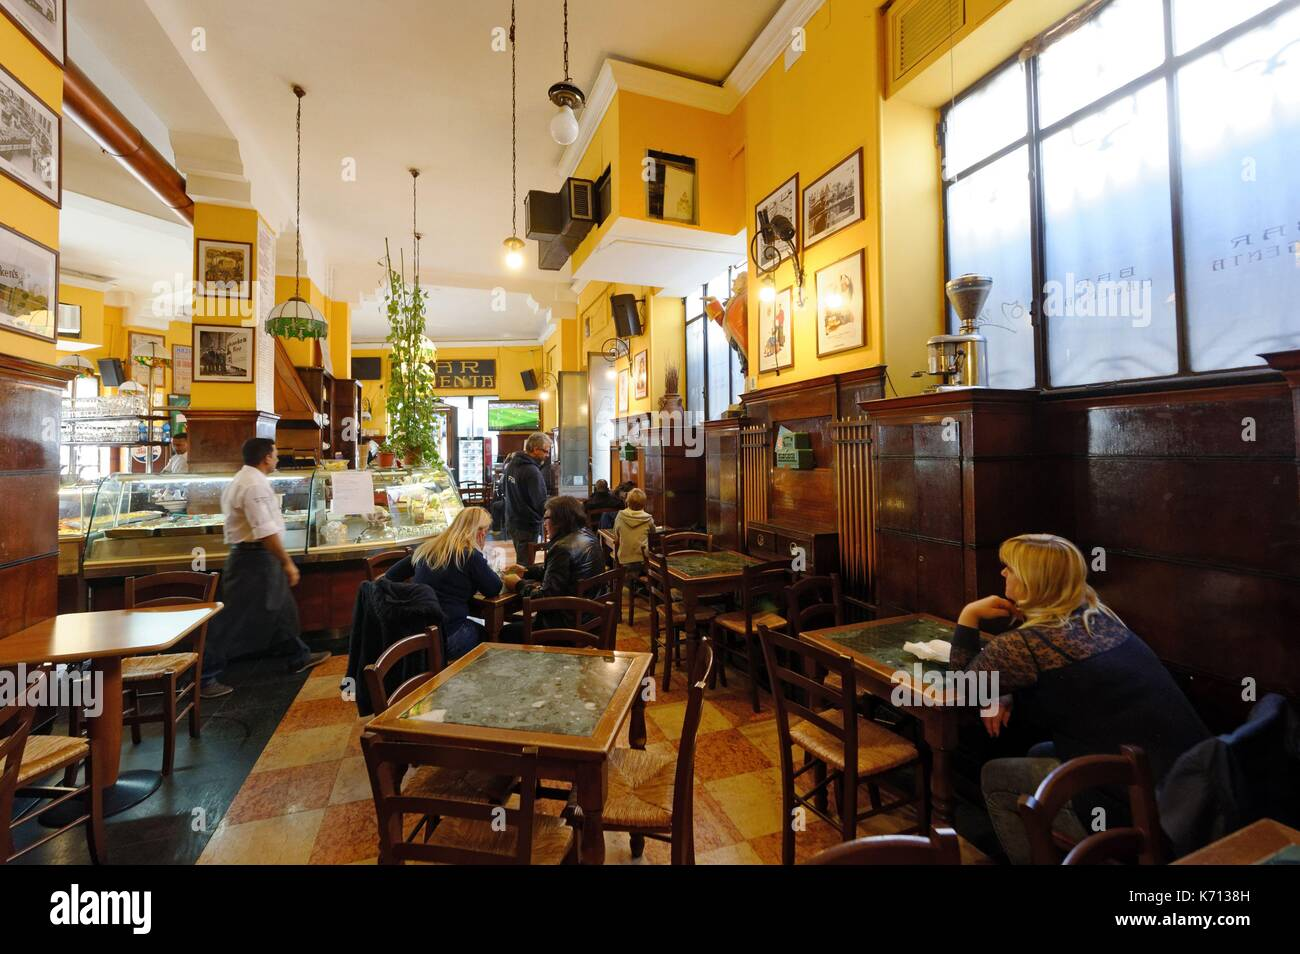 Italy, Lombardy, Milan, Magenta district, Bar Magenta - Stock Image